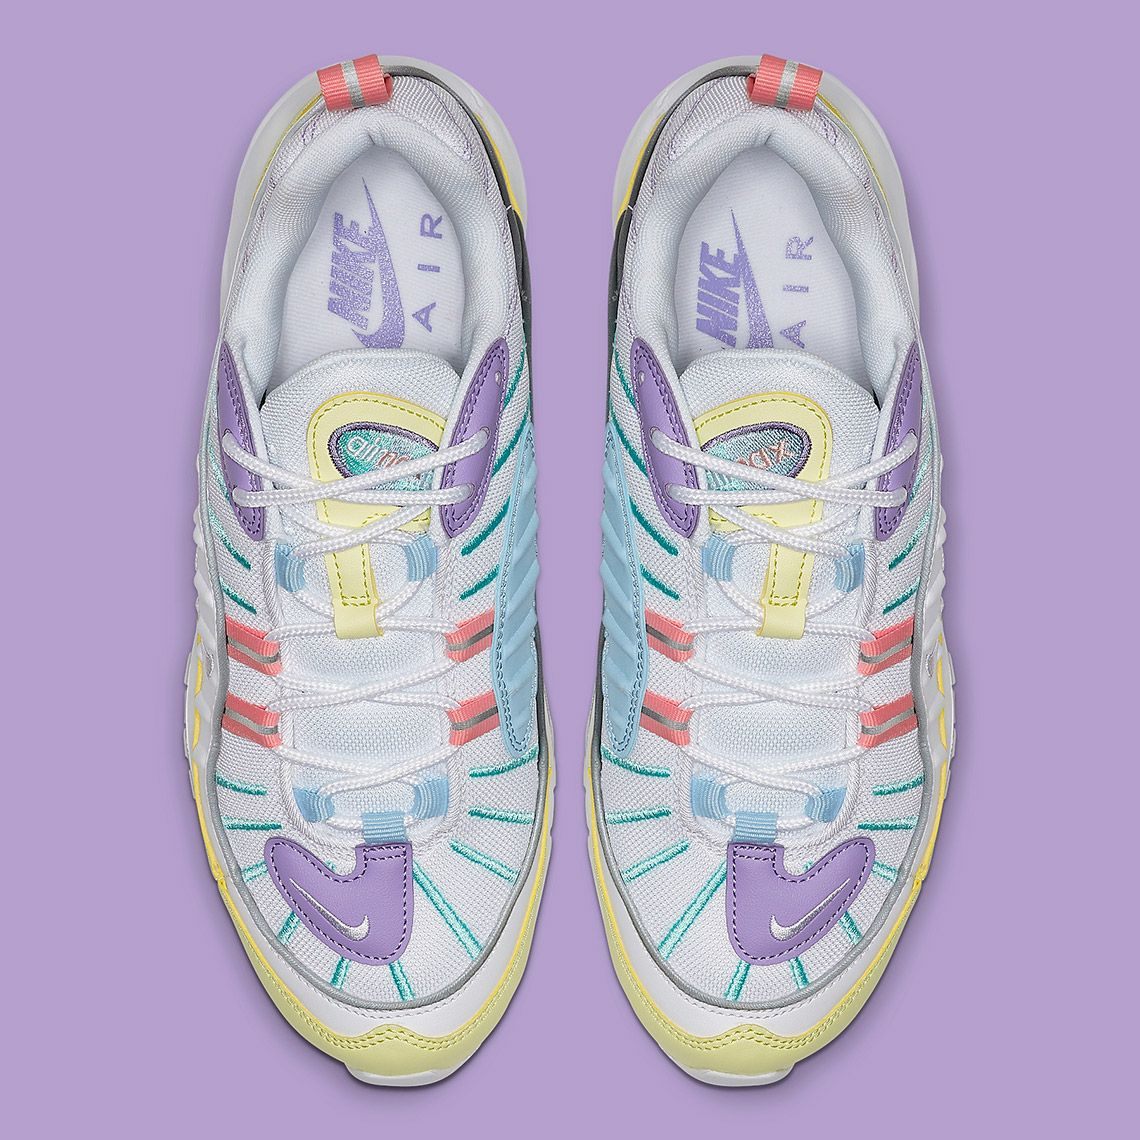 Nike Air Max 98 Easter AH6799 300 Release Info | SneakerNews.com ...